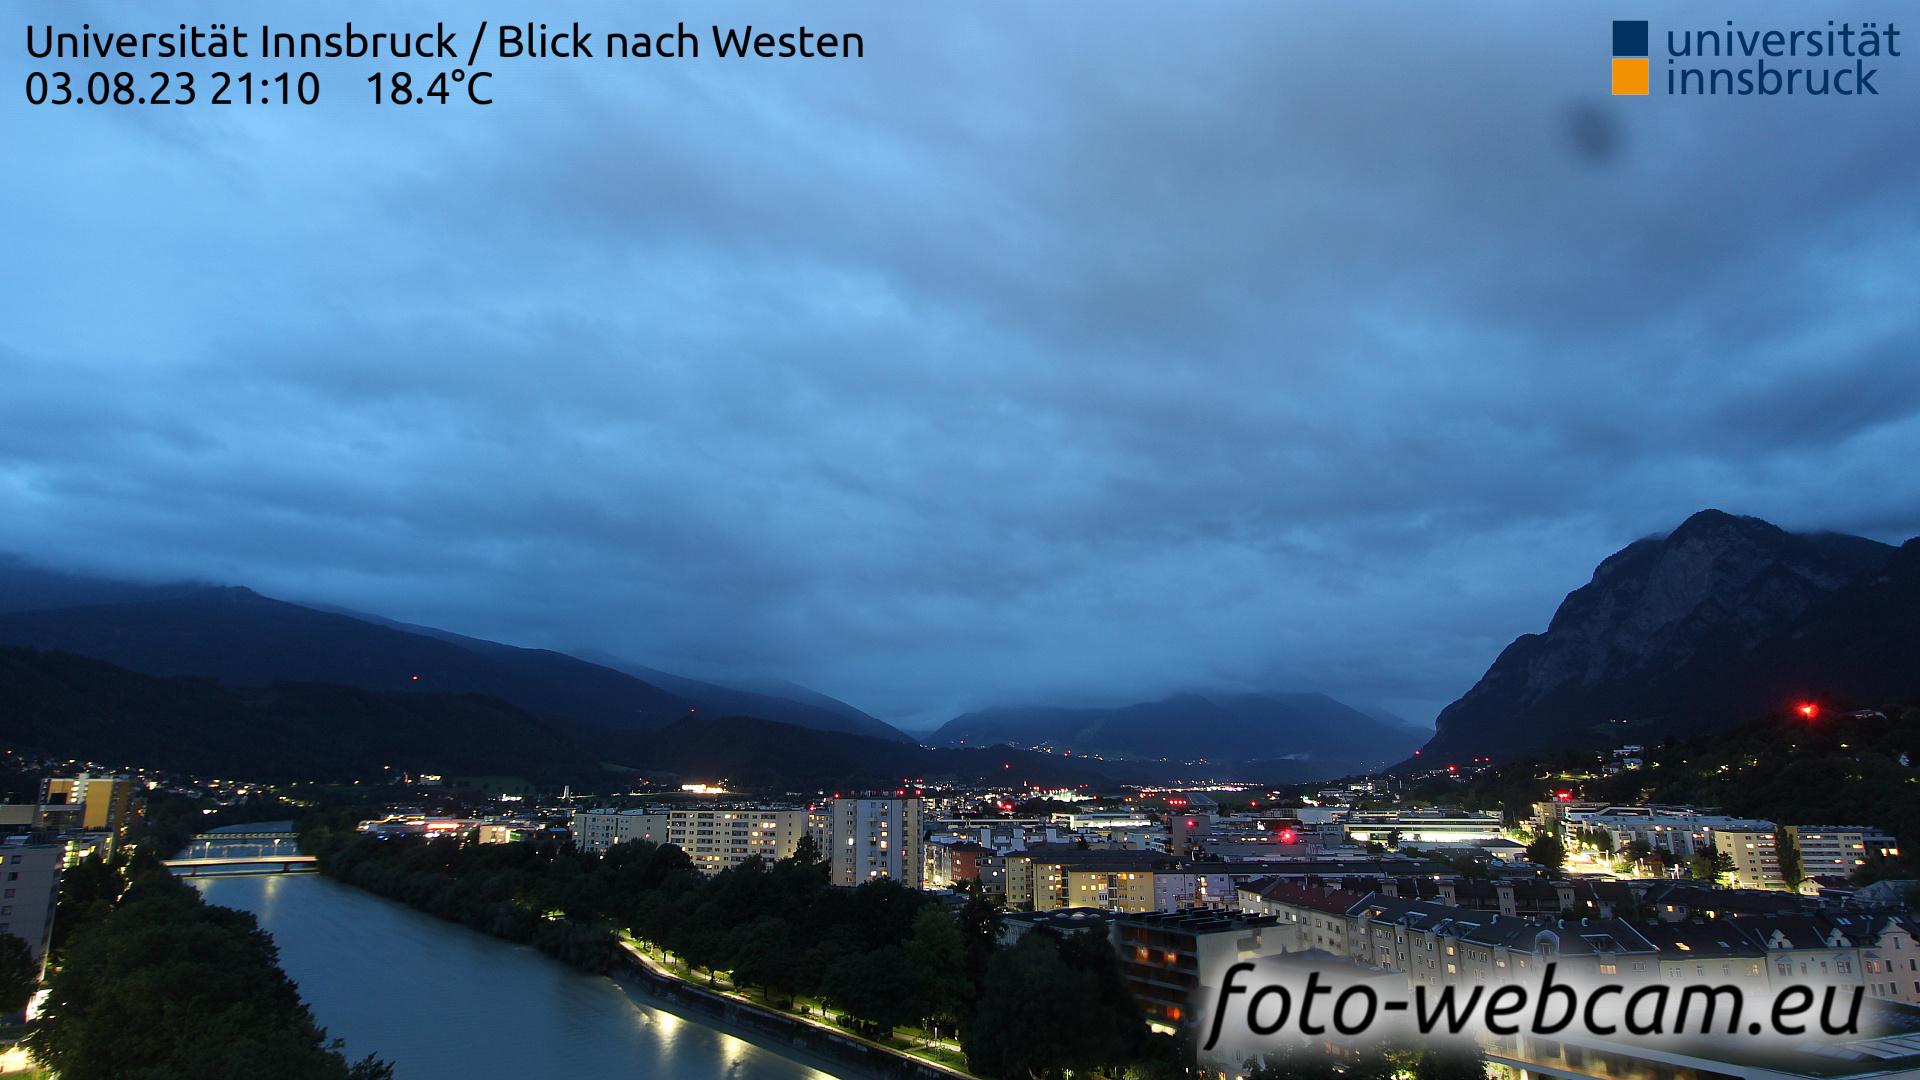 Innsbruck Sun. 21:25